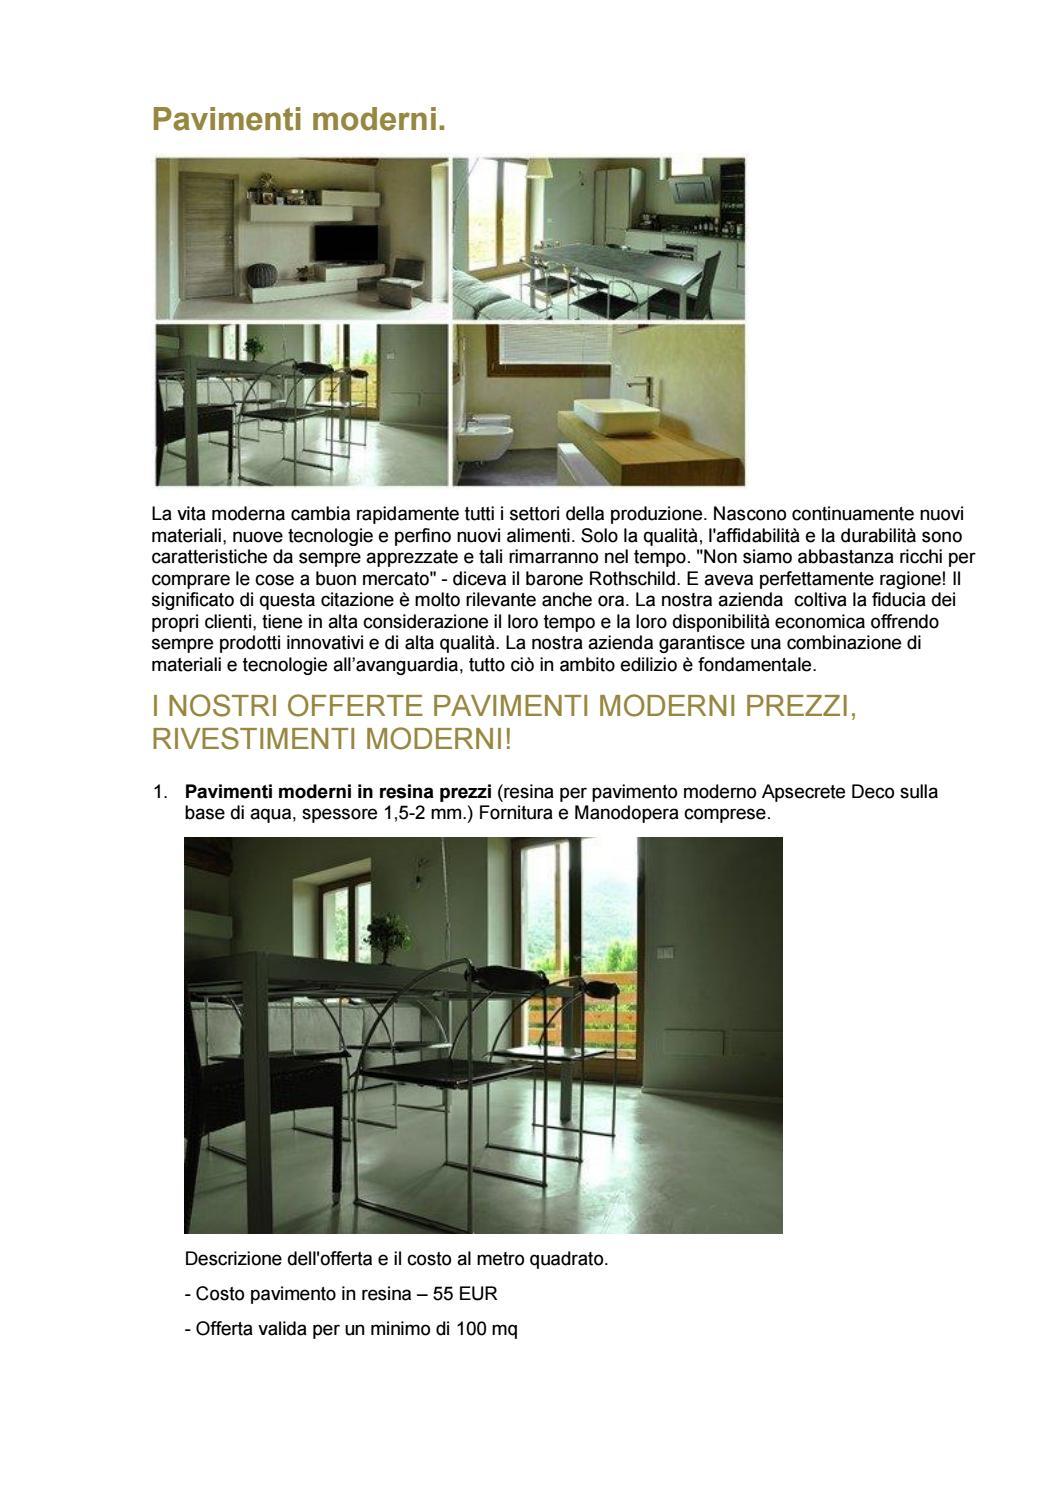 Costo Posa Resina Al Mq.Pavimenti Moderni By Minirasex Issuu